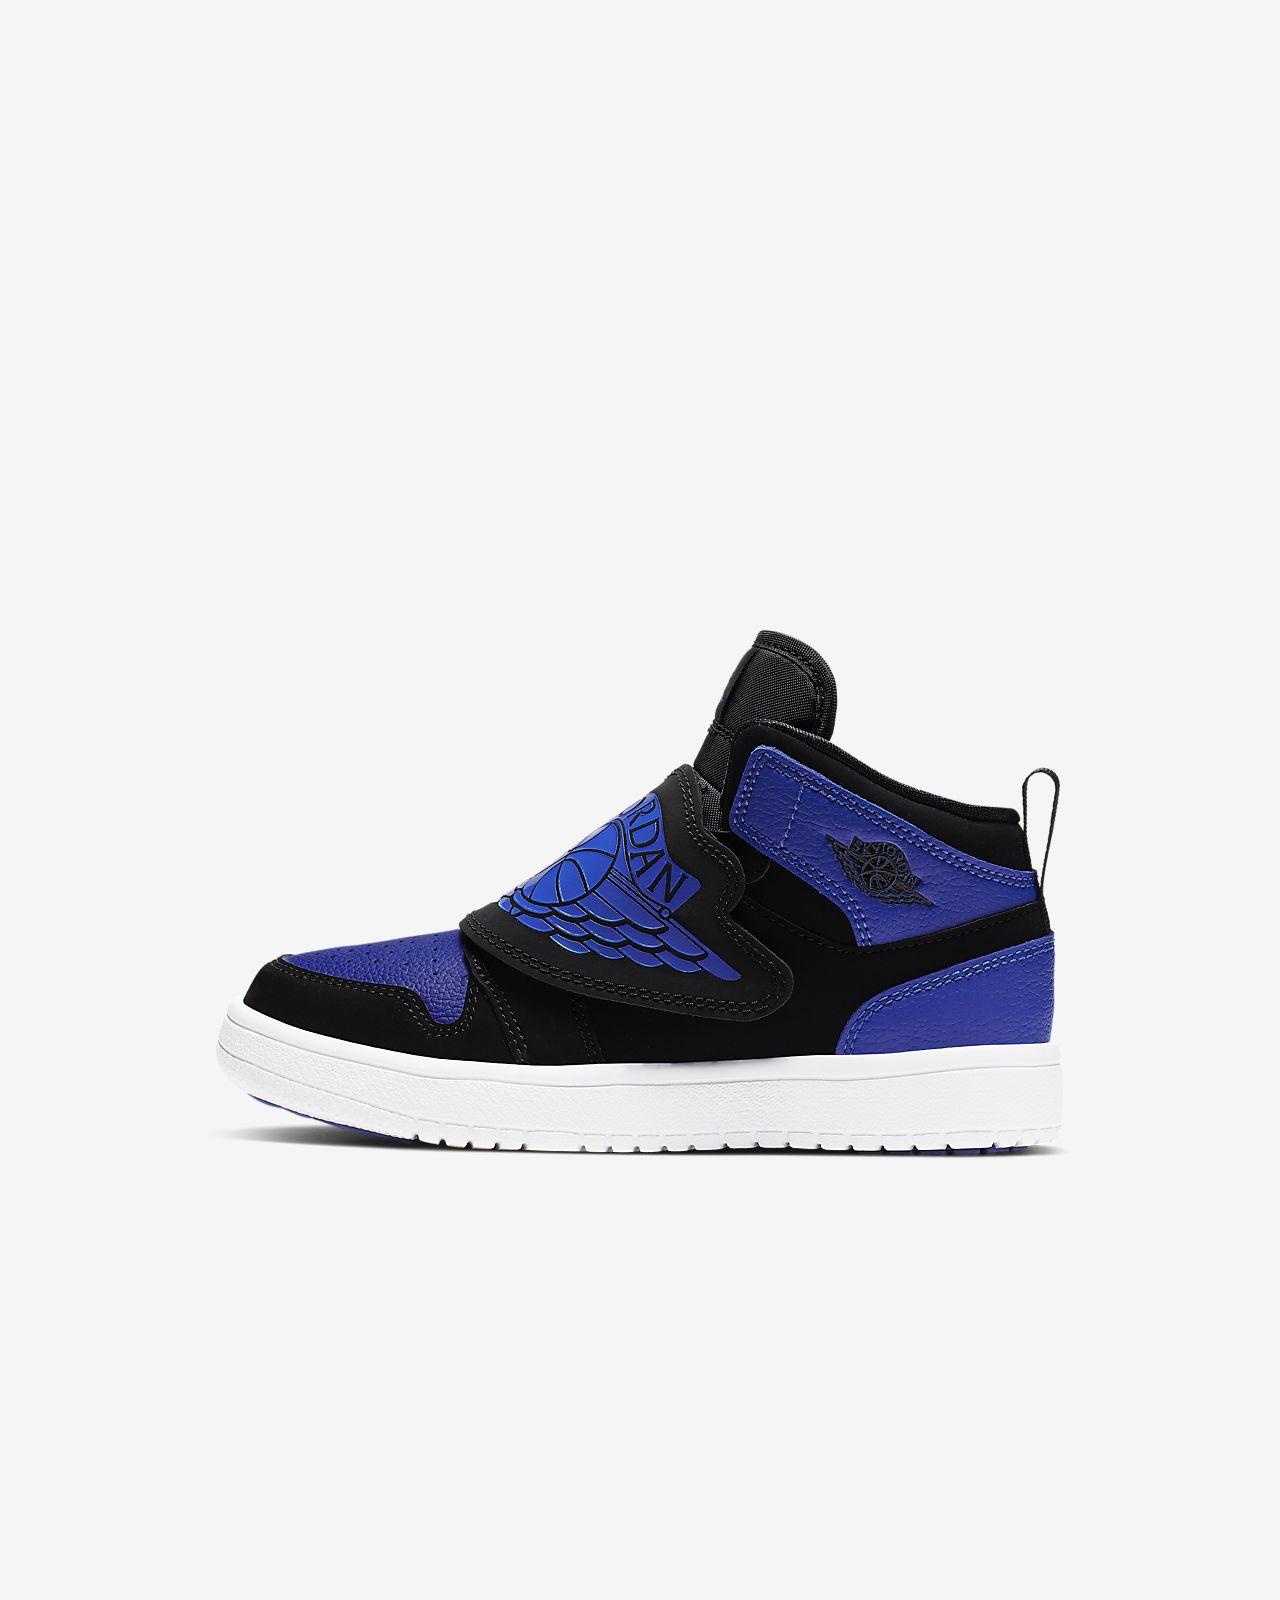 Sky Jordan 1 Schuh für jüngere Kinder